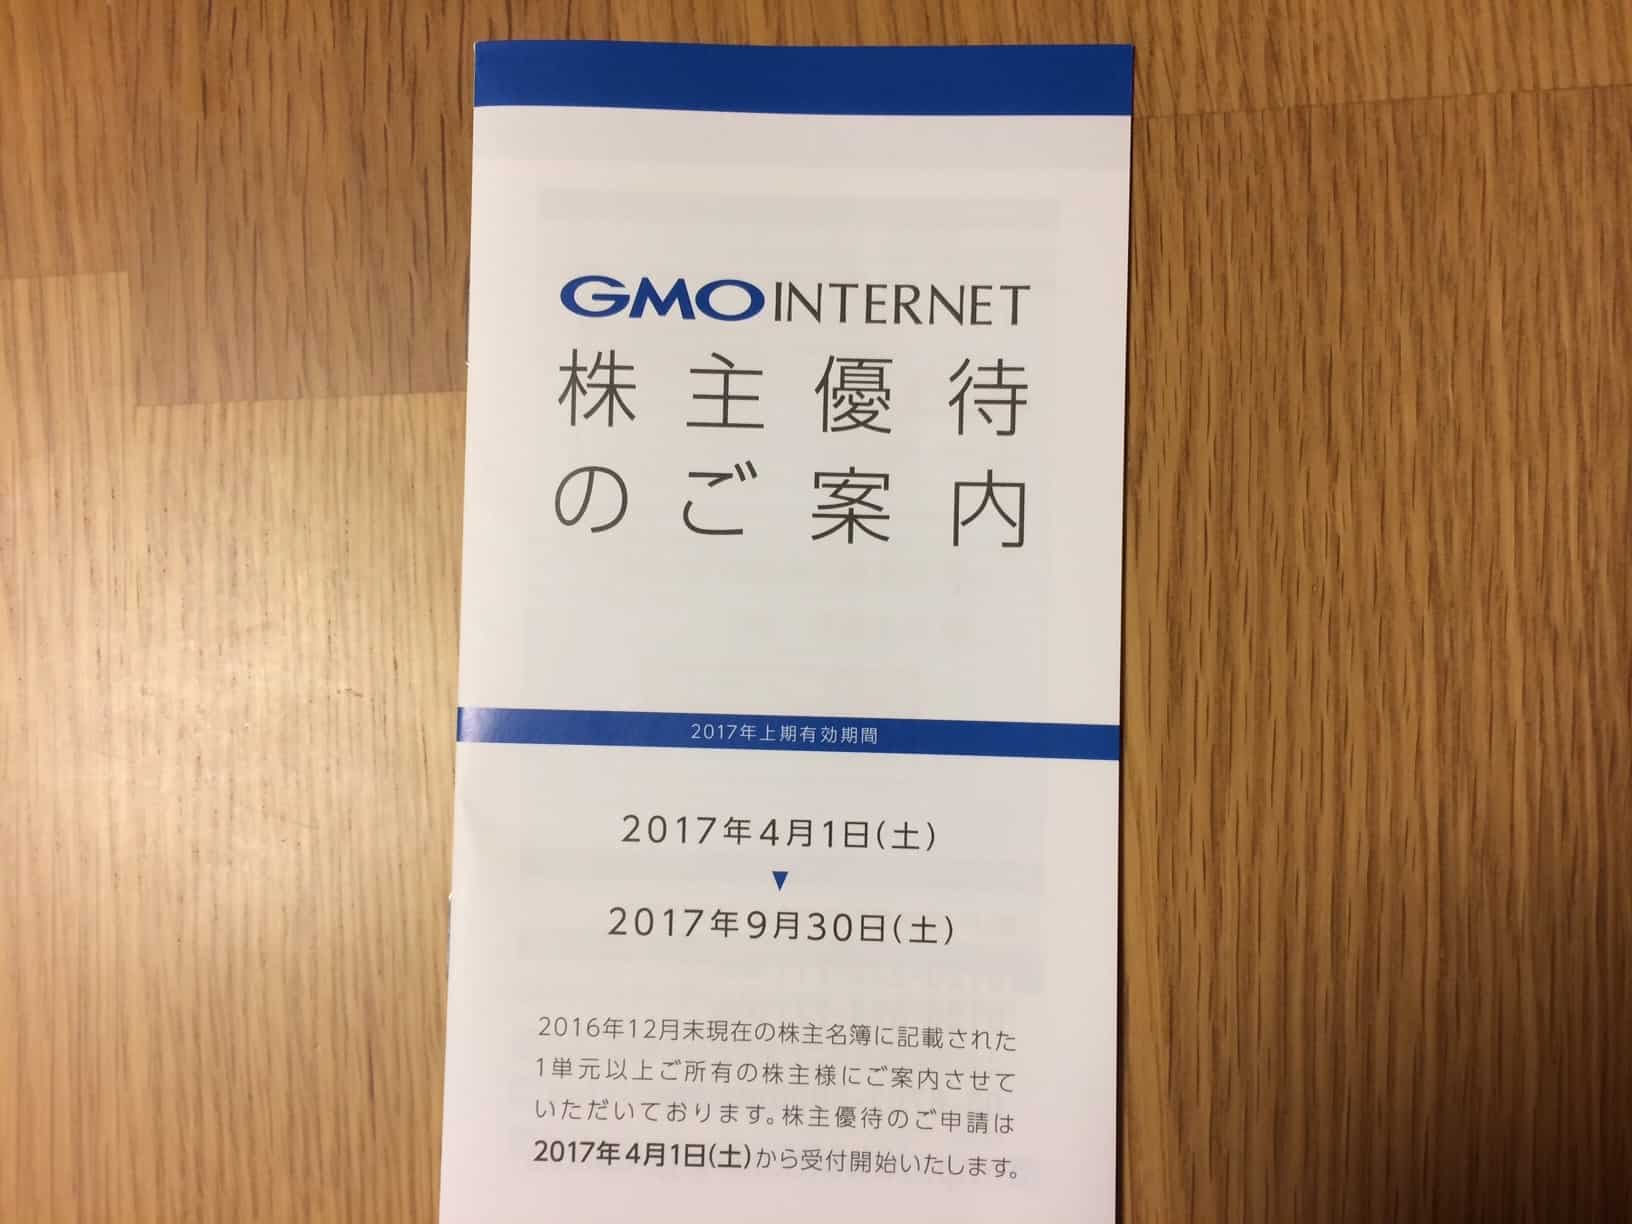 GMOインターネット(9449)から株主優待が到着!早速登録でGMOクリック証券の手数料無料へ!